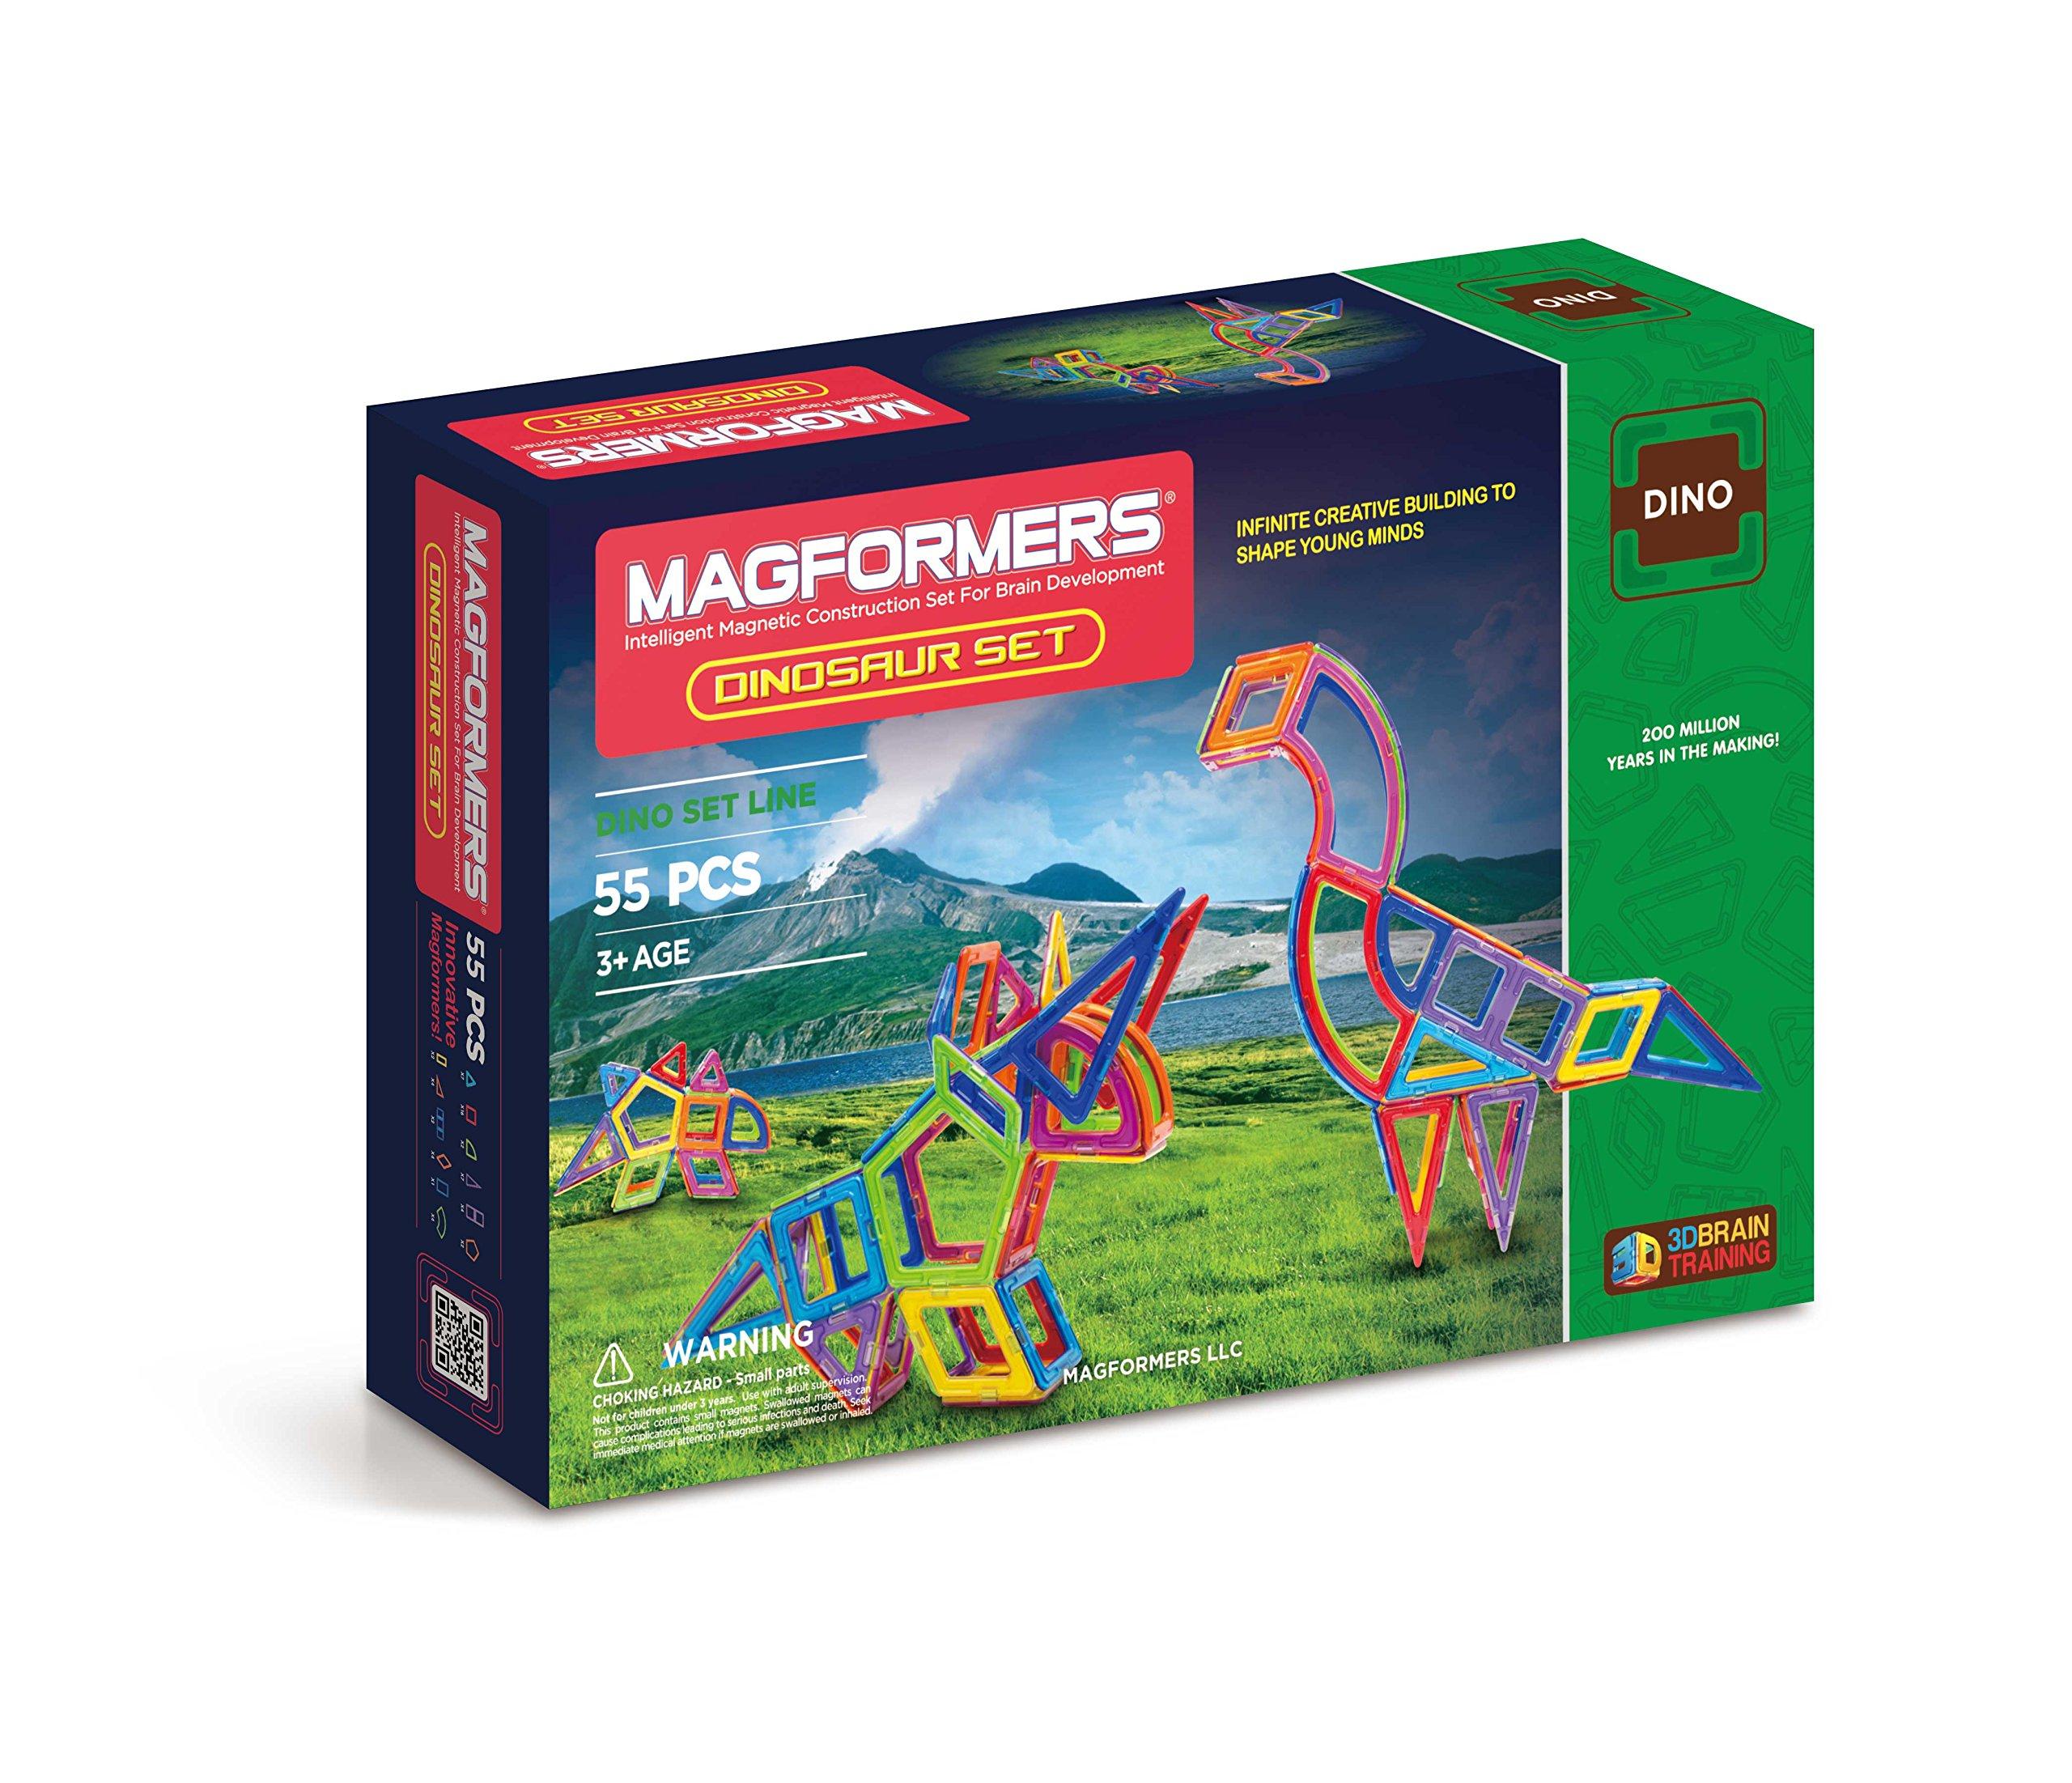 Magformers Dinosaur Set (55-pieces) Magnetic Building Blocks, Educational Magnetic Tiles Kit , Magnetic Construction STEM Toy Set